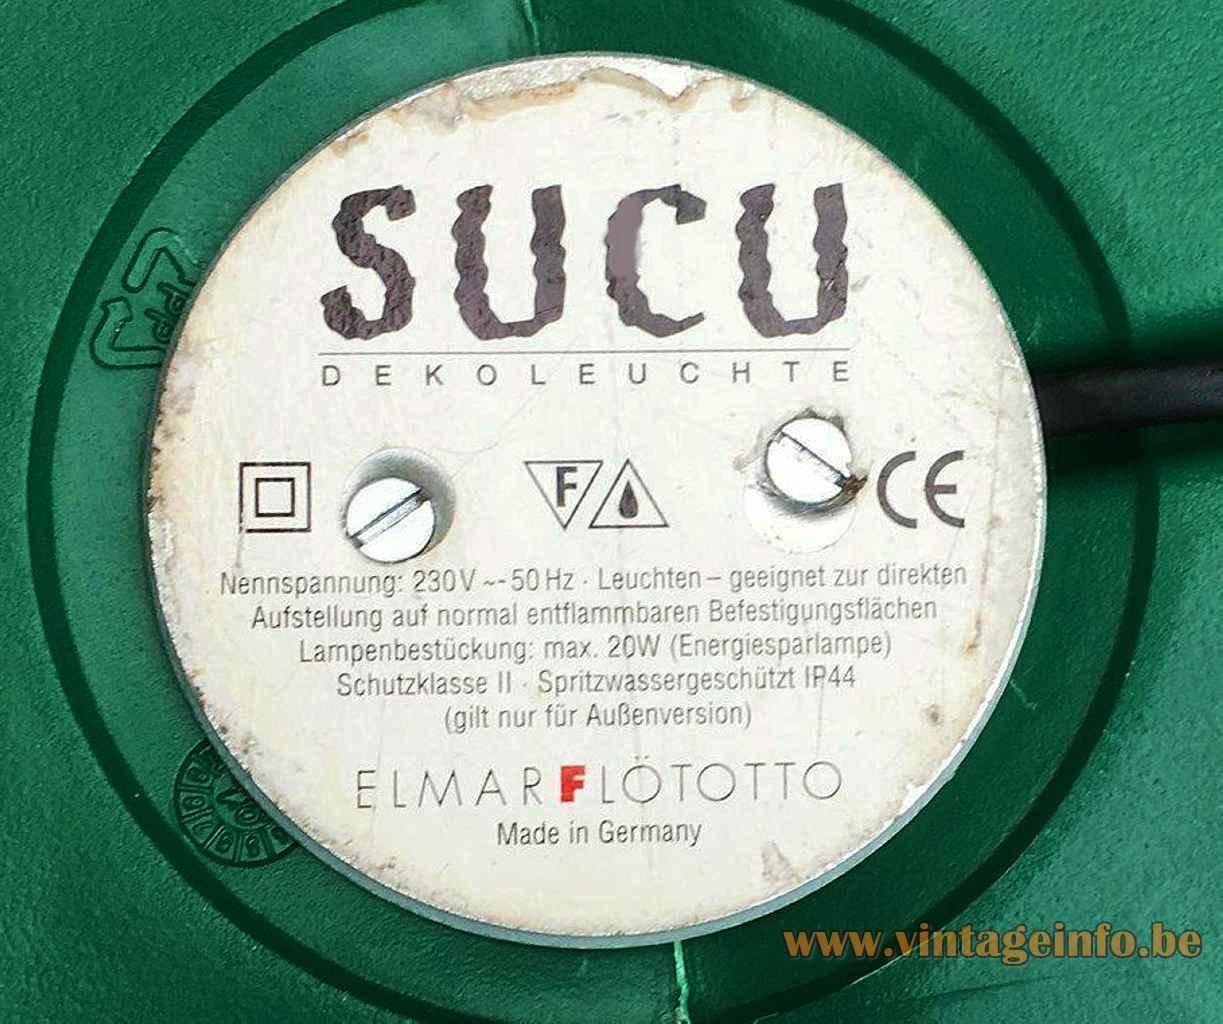 Flötotto Sucu cactus floor lamp round label bottom 1990s design: Art Nowo Germany 2000s